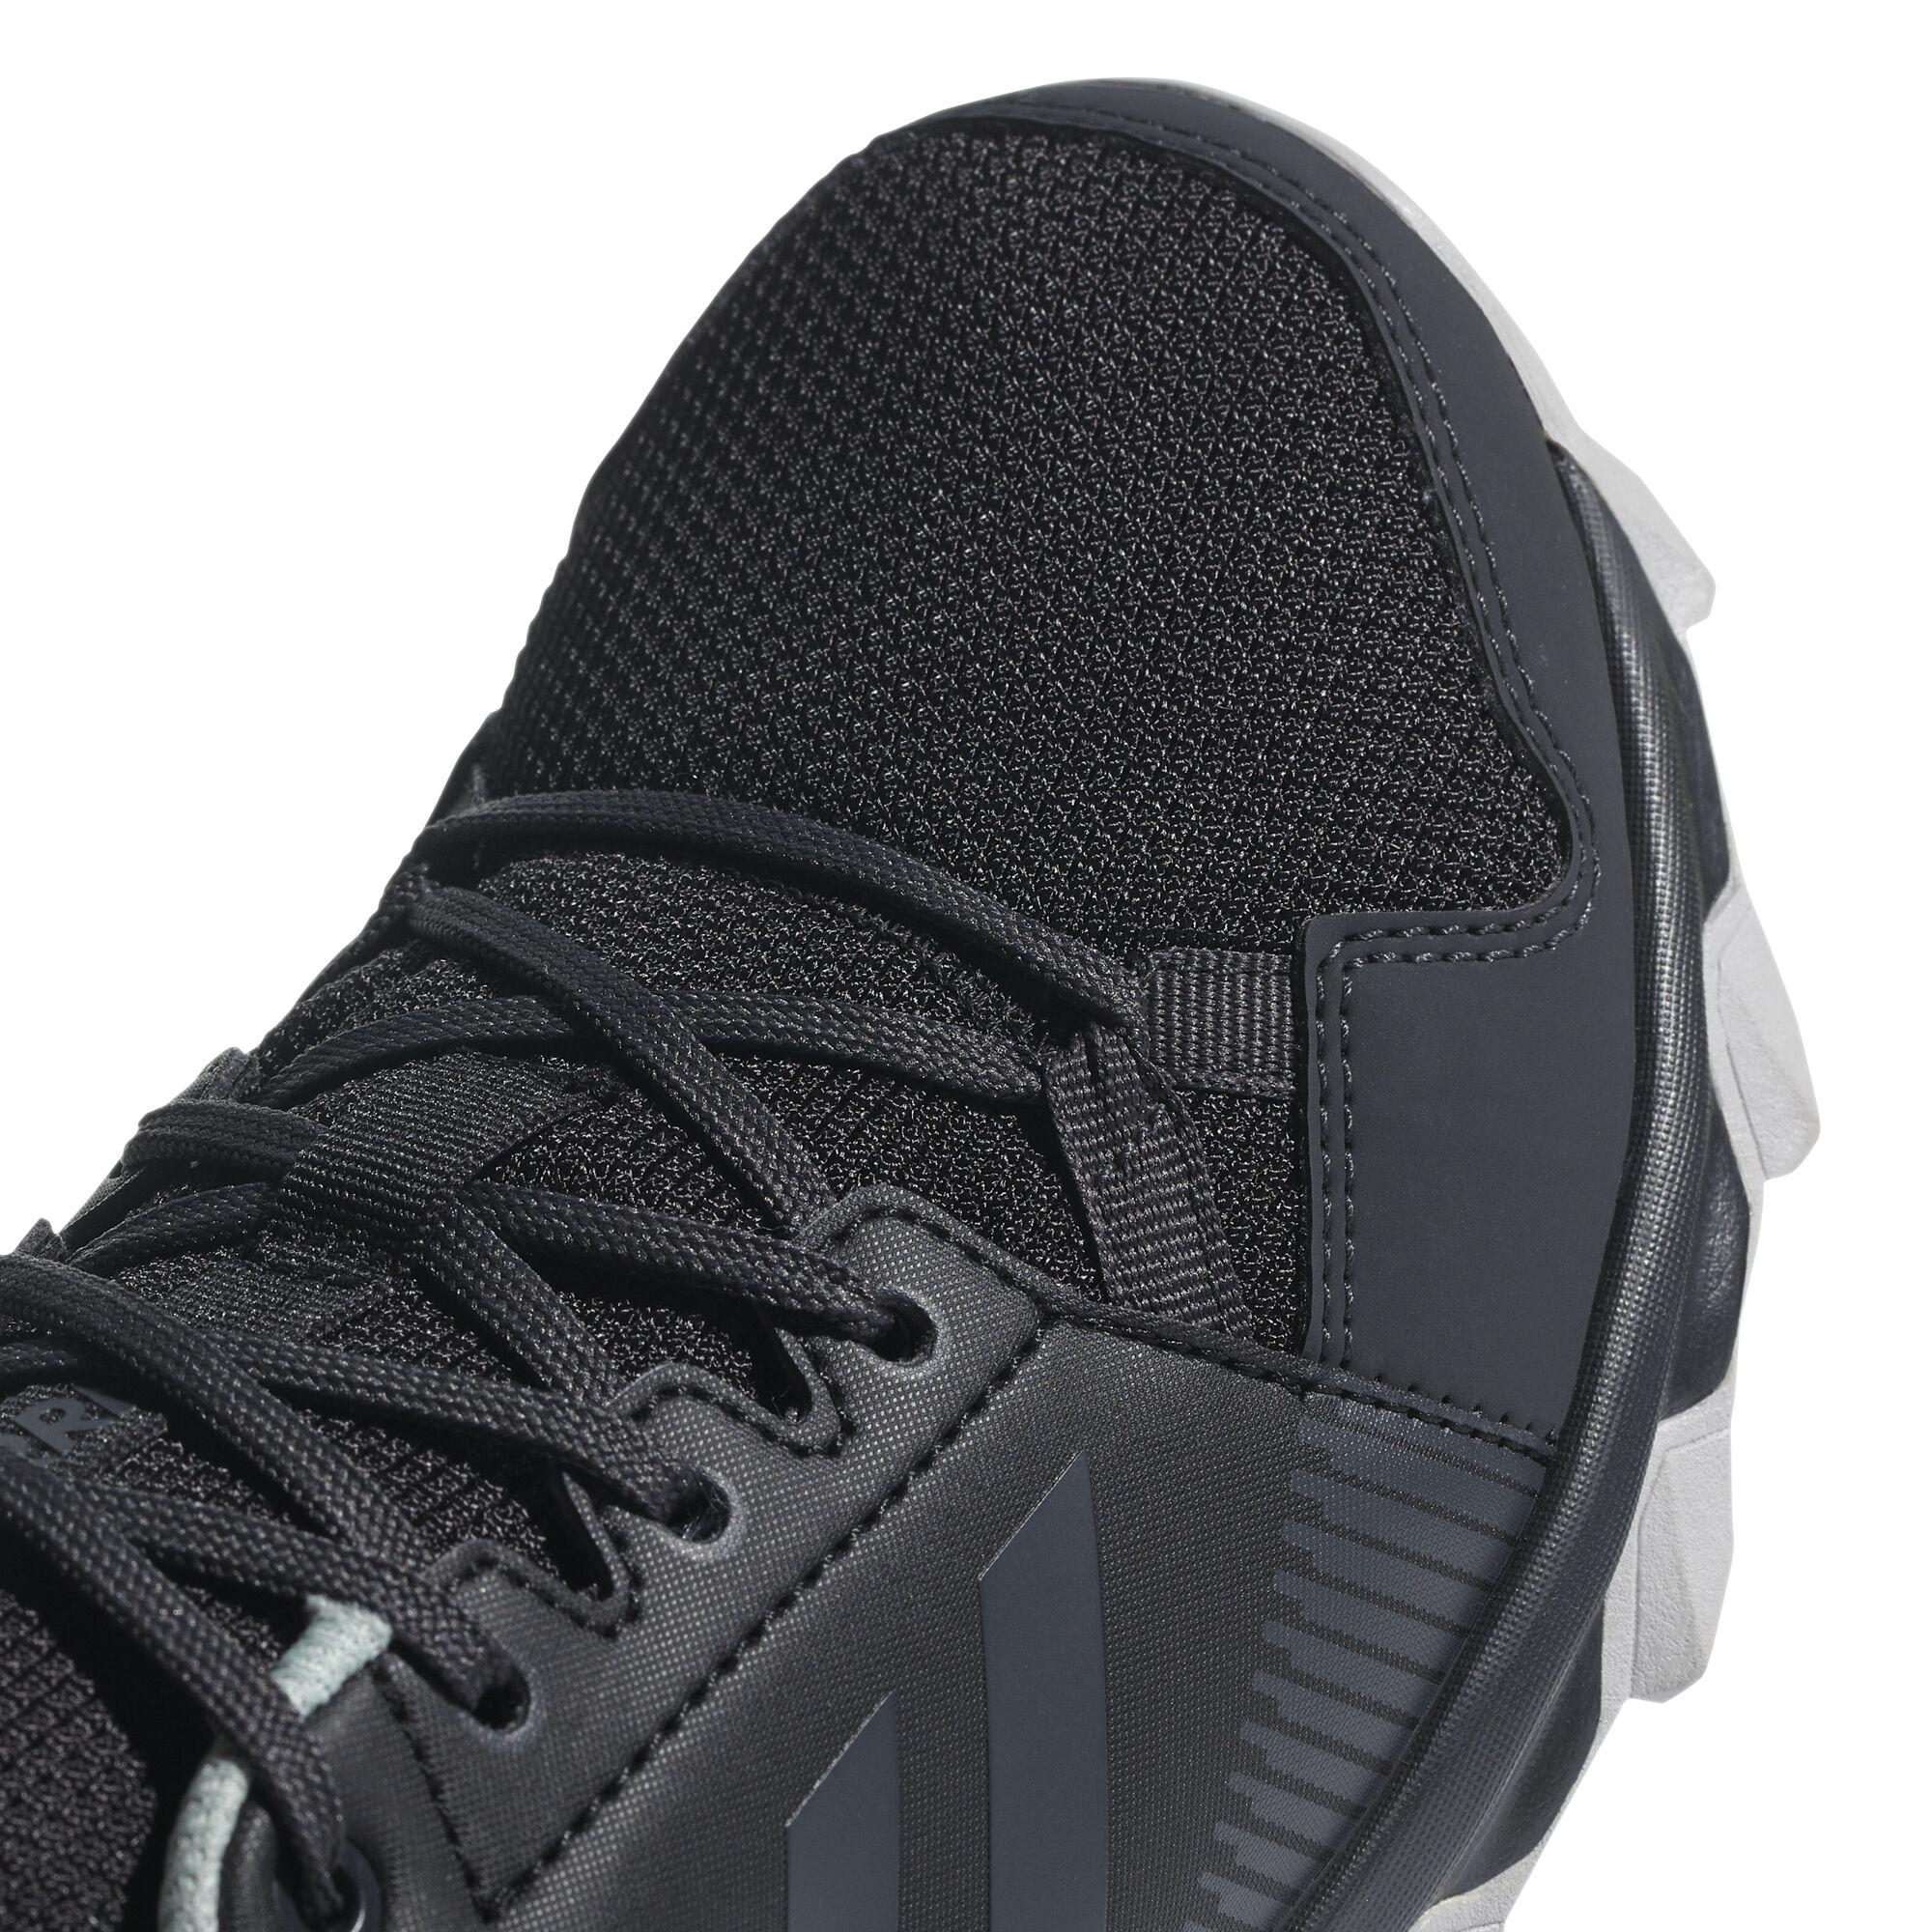 buy adidas Terrex Tracerocker GTX Trail Running Shoe Women - Black ... a08d8e99c